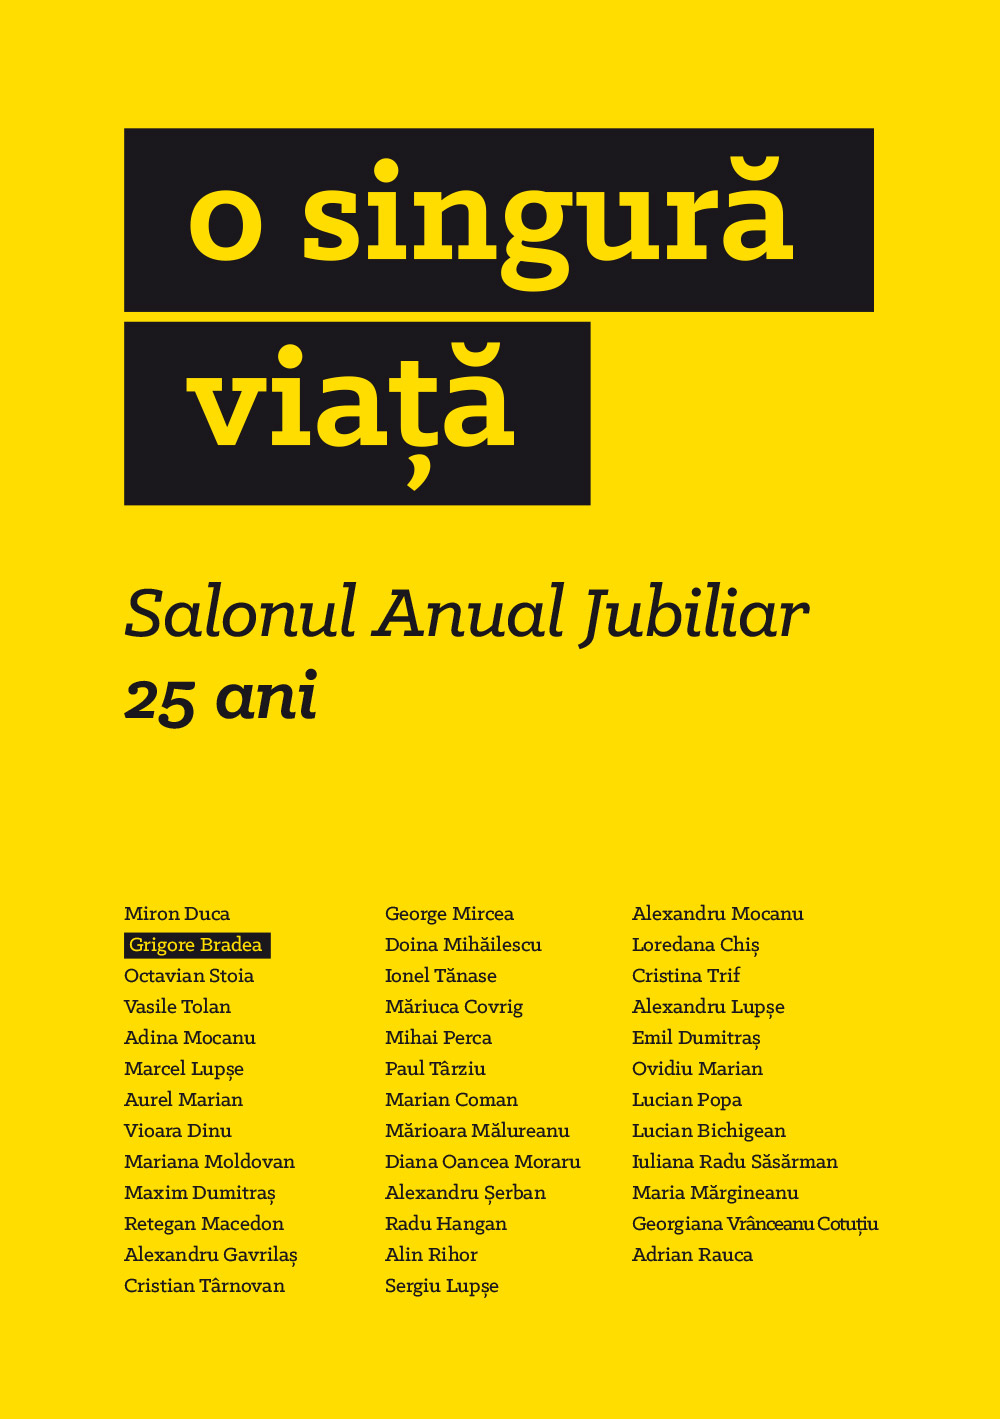 poster_o_singura_viata_salonul_anual_jubiliar